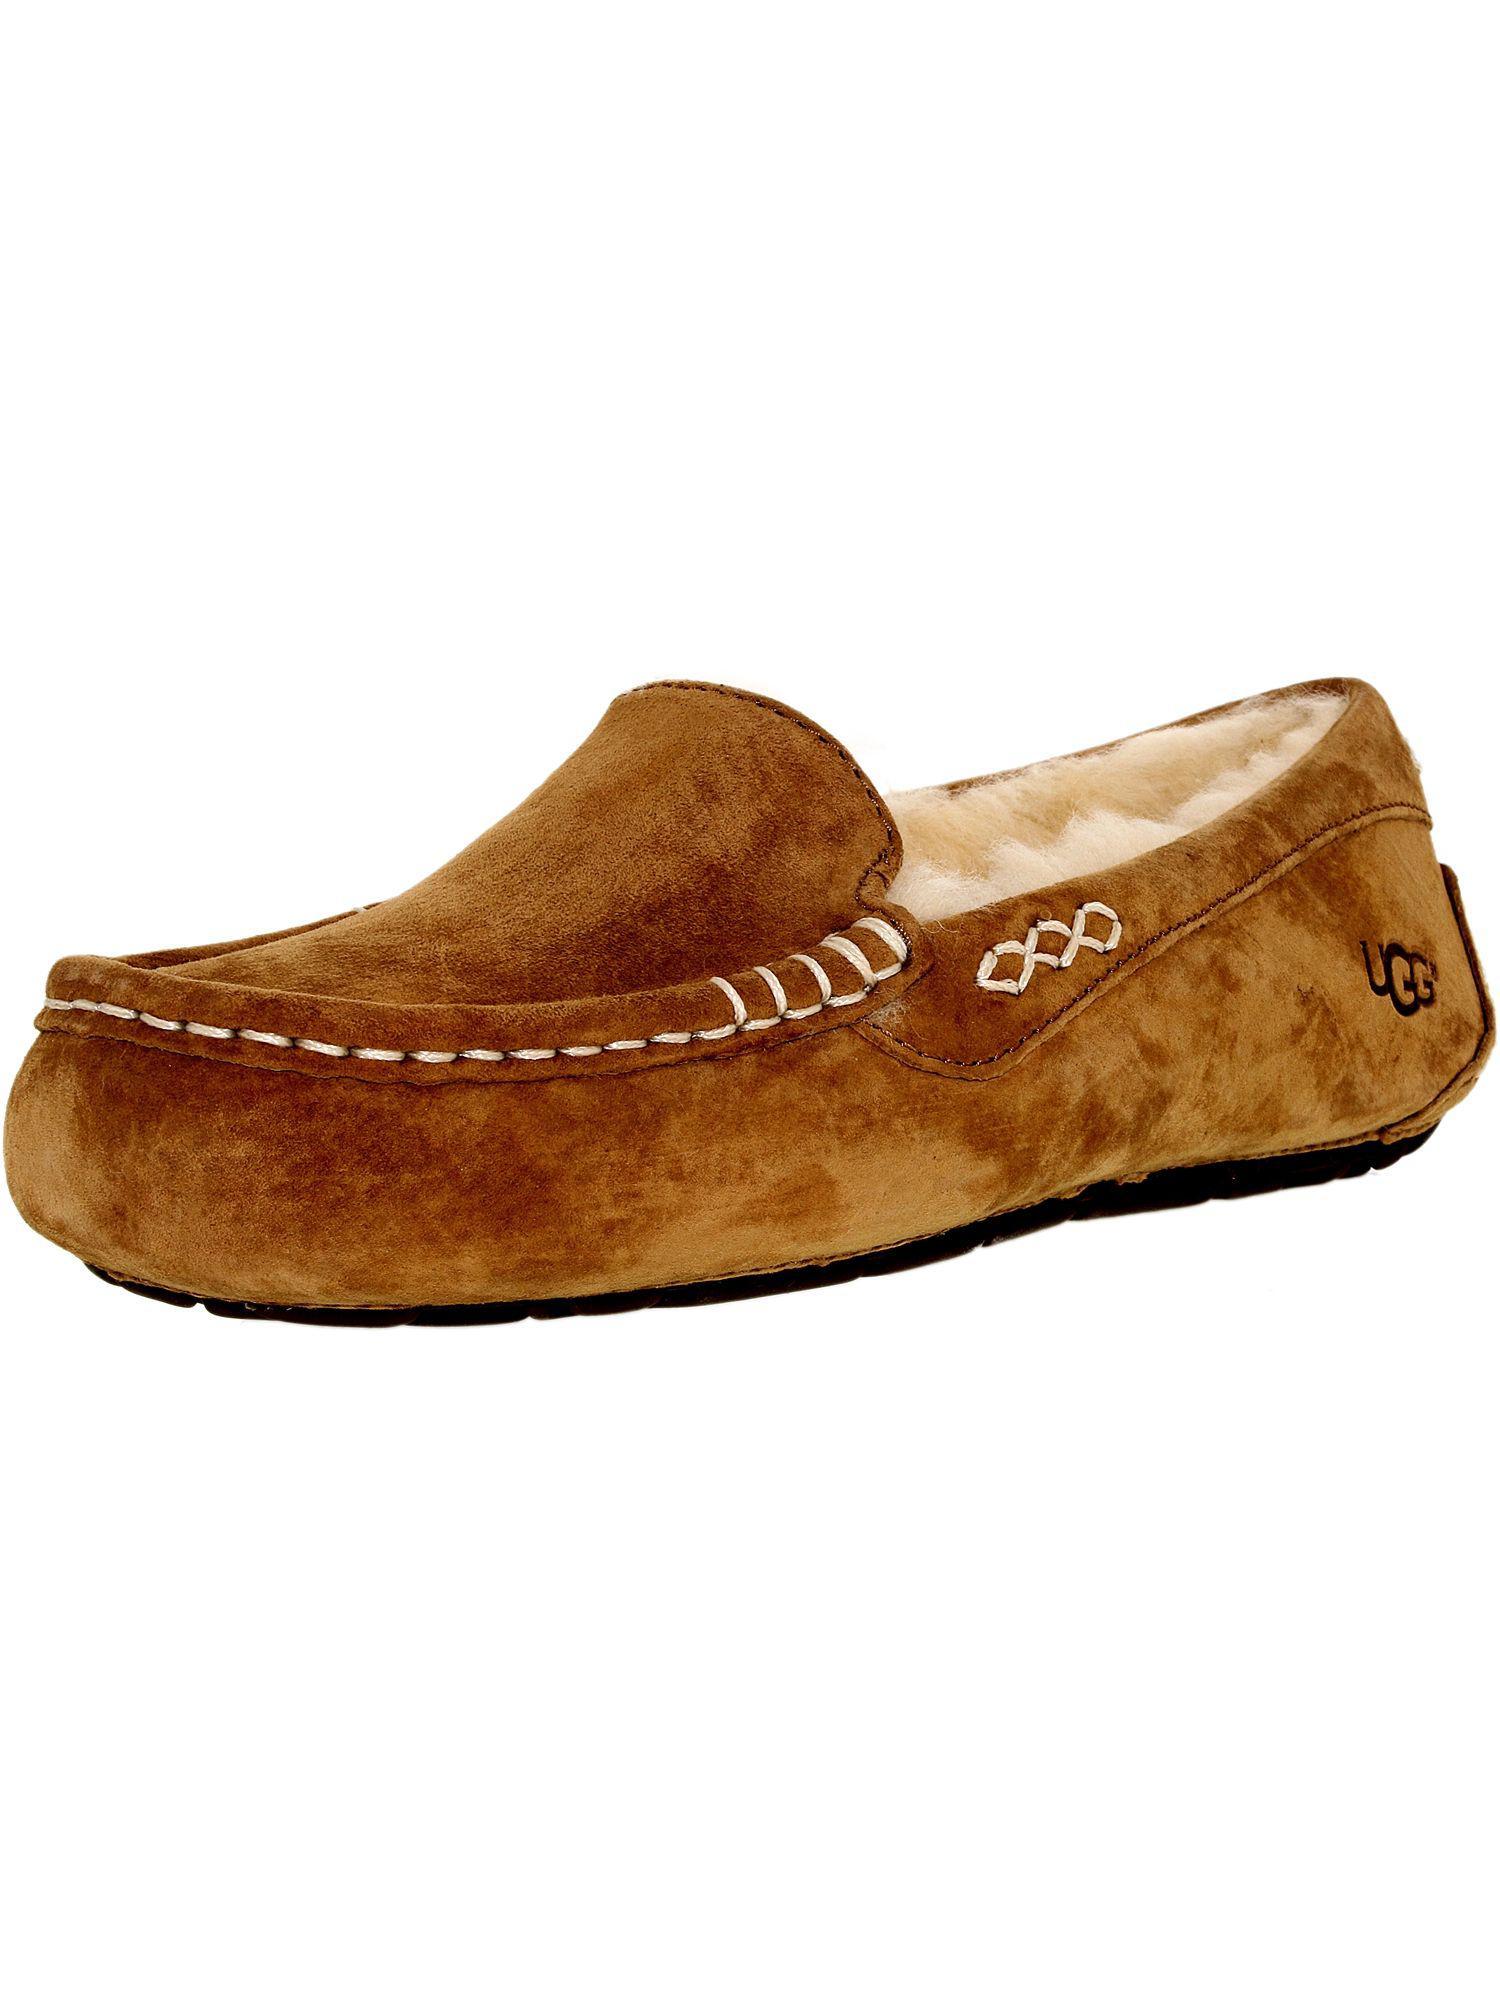 f169d7612c7 Lyst - Ugg Women's Ansley Chestnut Ankle-high Wool Slipper - 5m in Brown